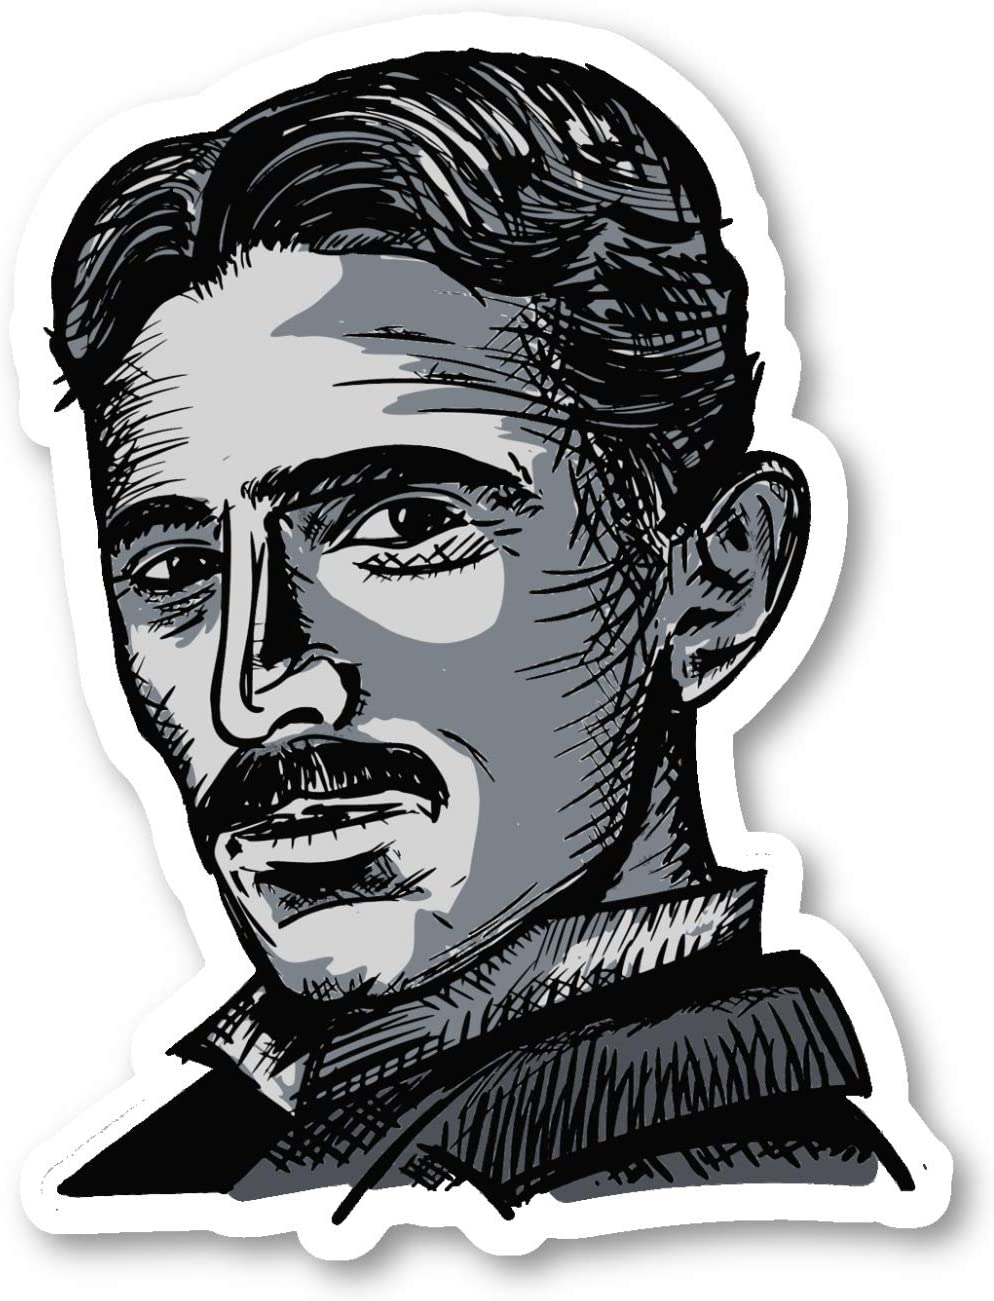 Nikola Tesla Sticker Historical Figures Stickers - Laptop Stickers - 2.5 Inches Vinyl Decal - Laptop, Phone, Tablet Vinyl Decal Sticker S214517